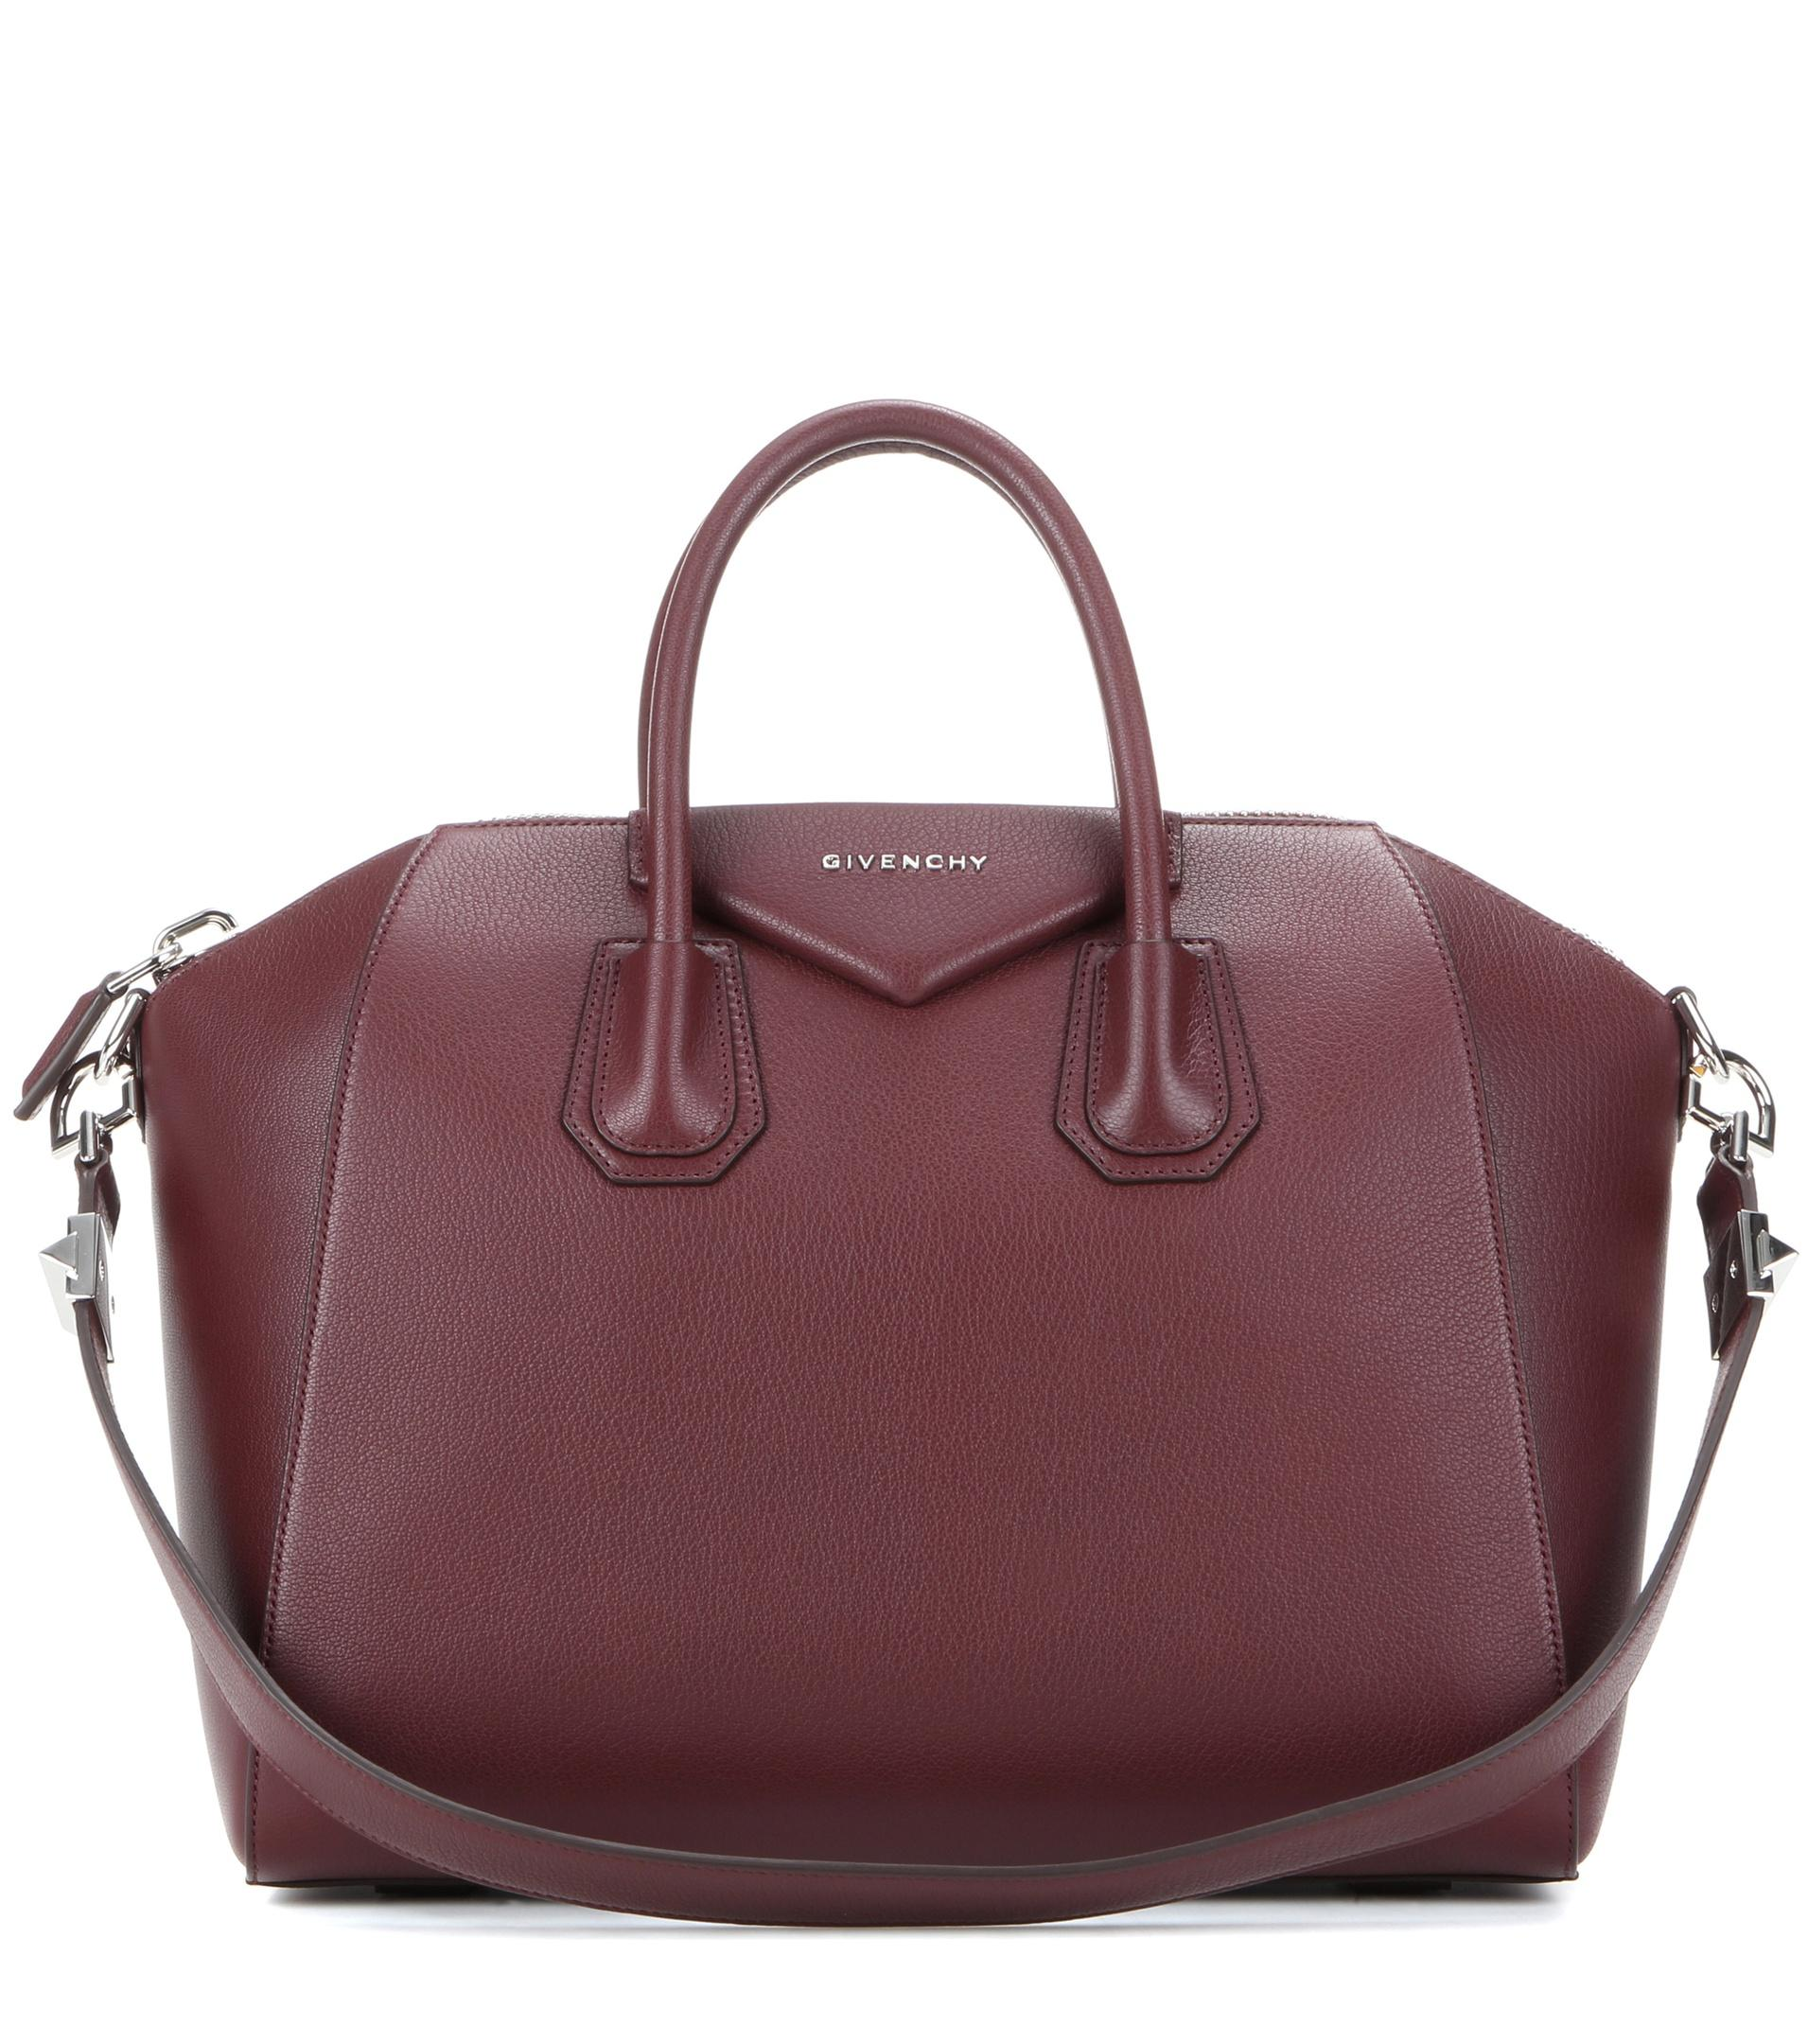 lyst givenchy 39 medium antigona 39 sugar leather satchel in. Black Bedroom Furniture Sets. Home Design Ideas